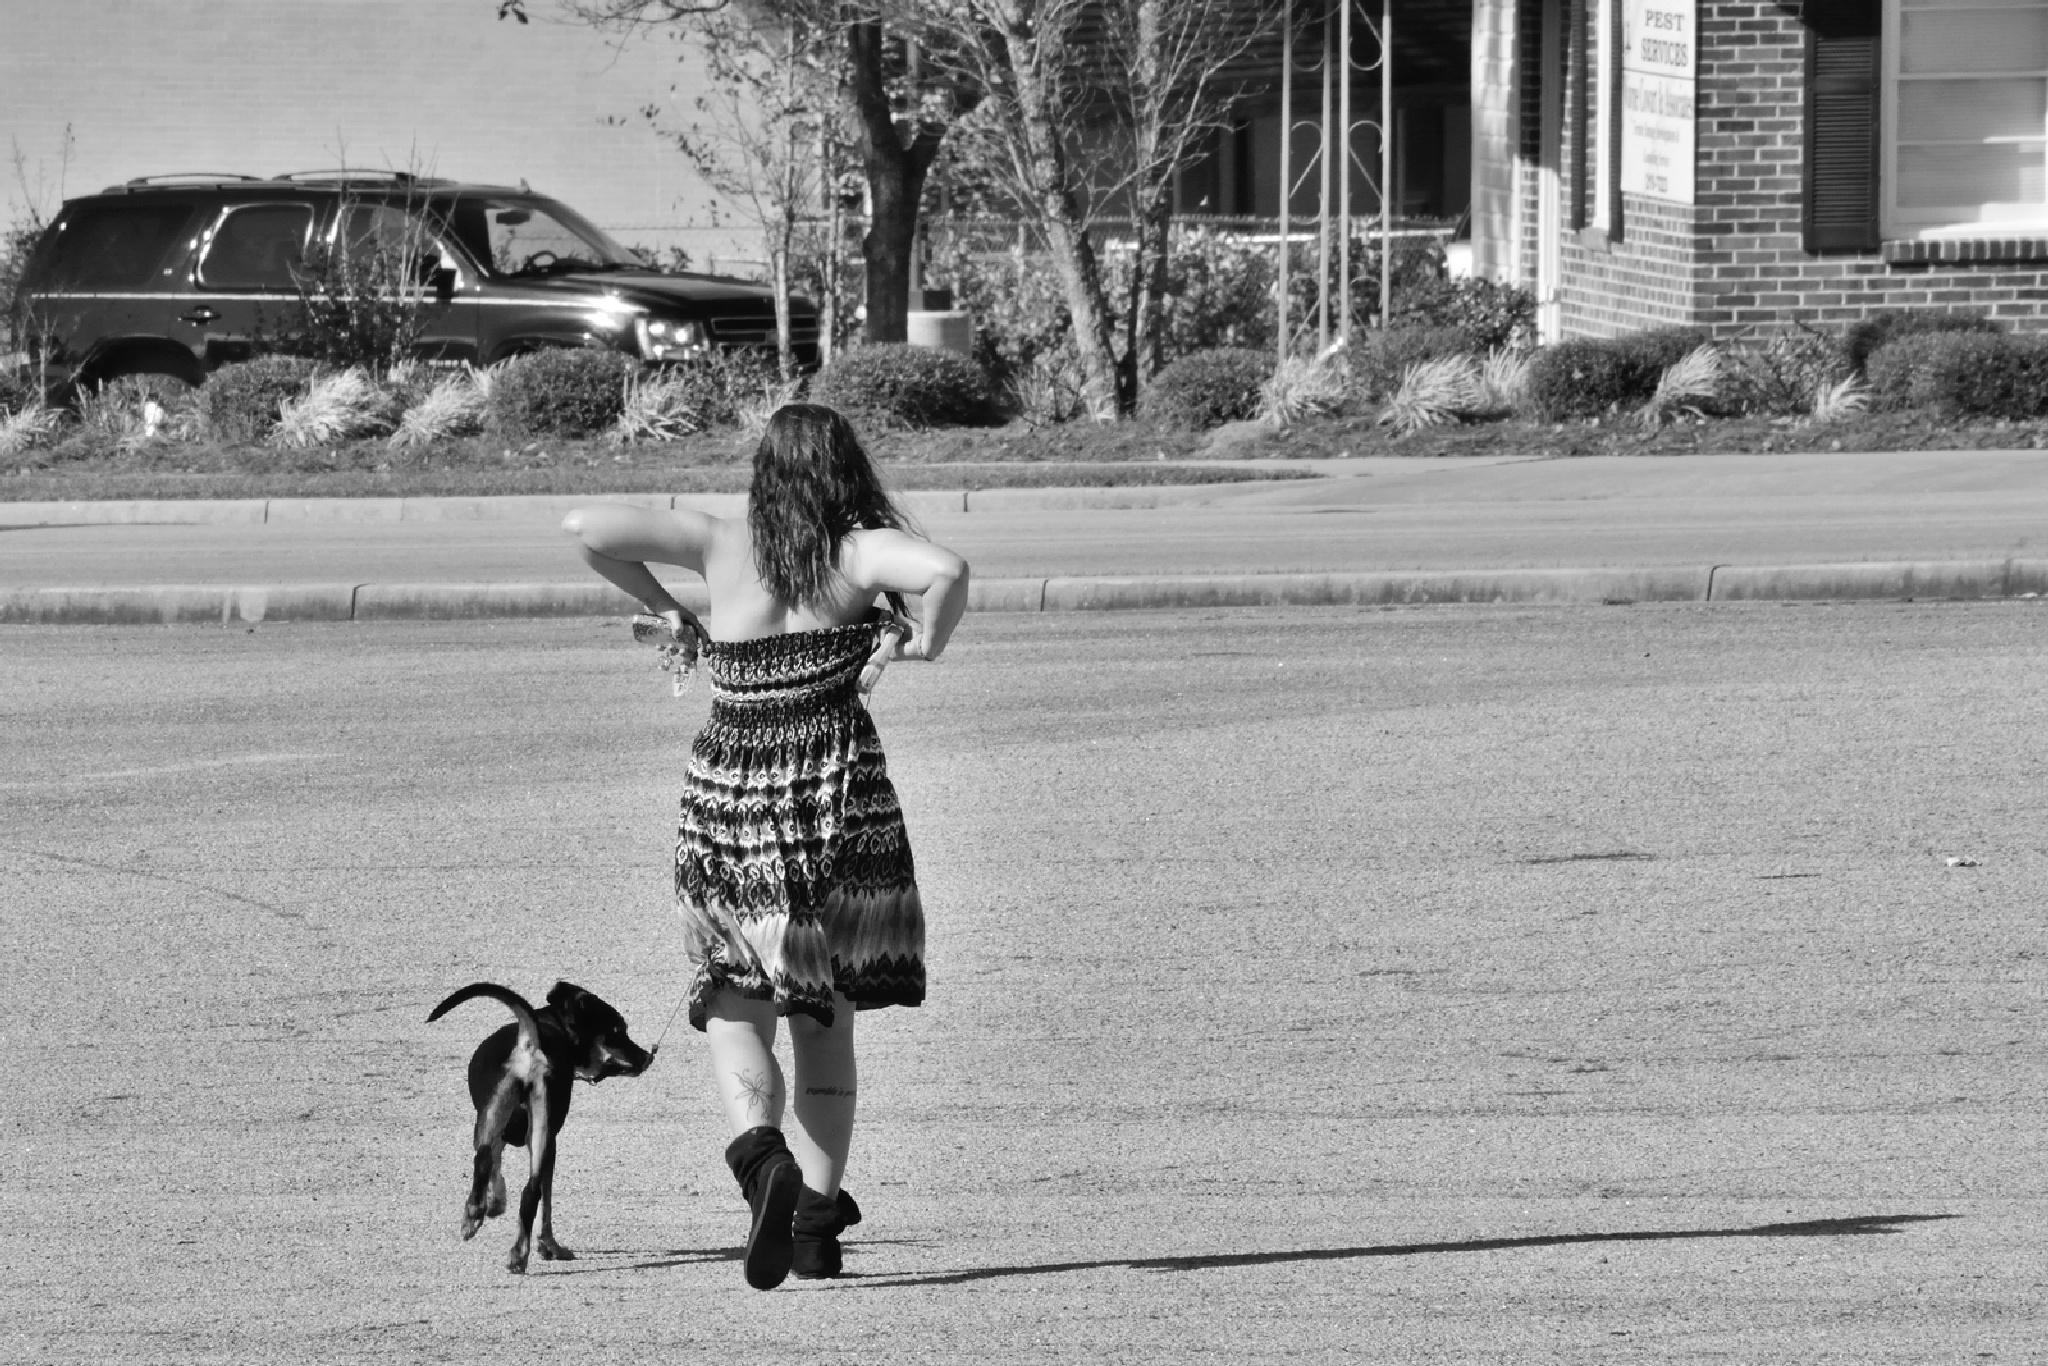 Puppy training. by jlbtwee